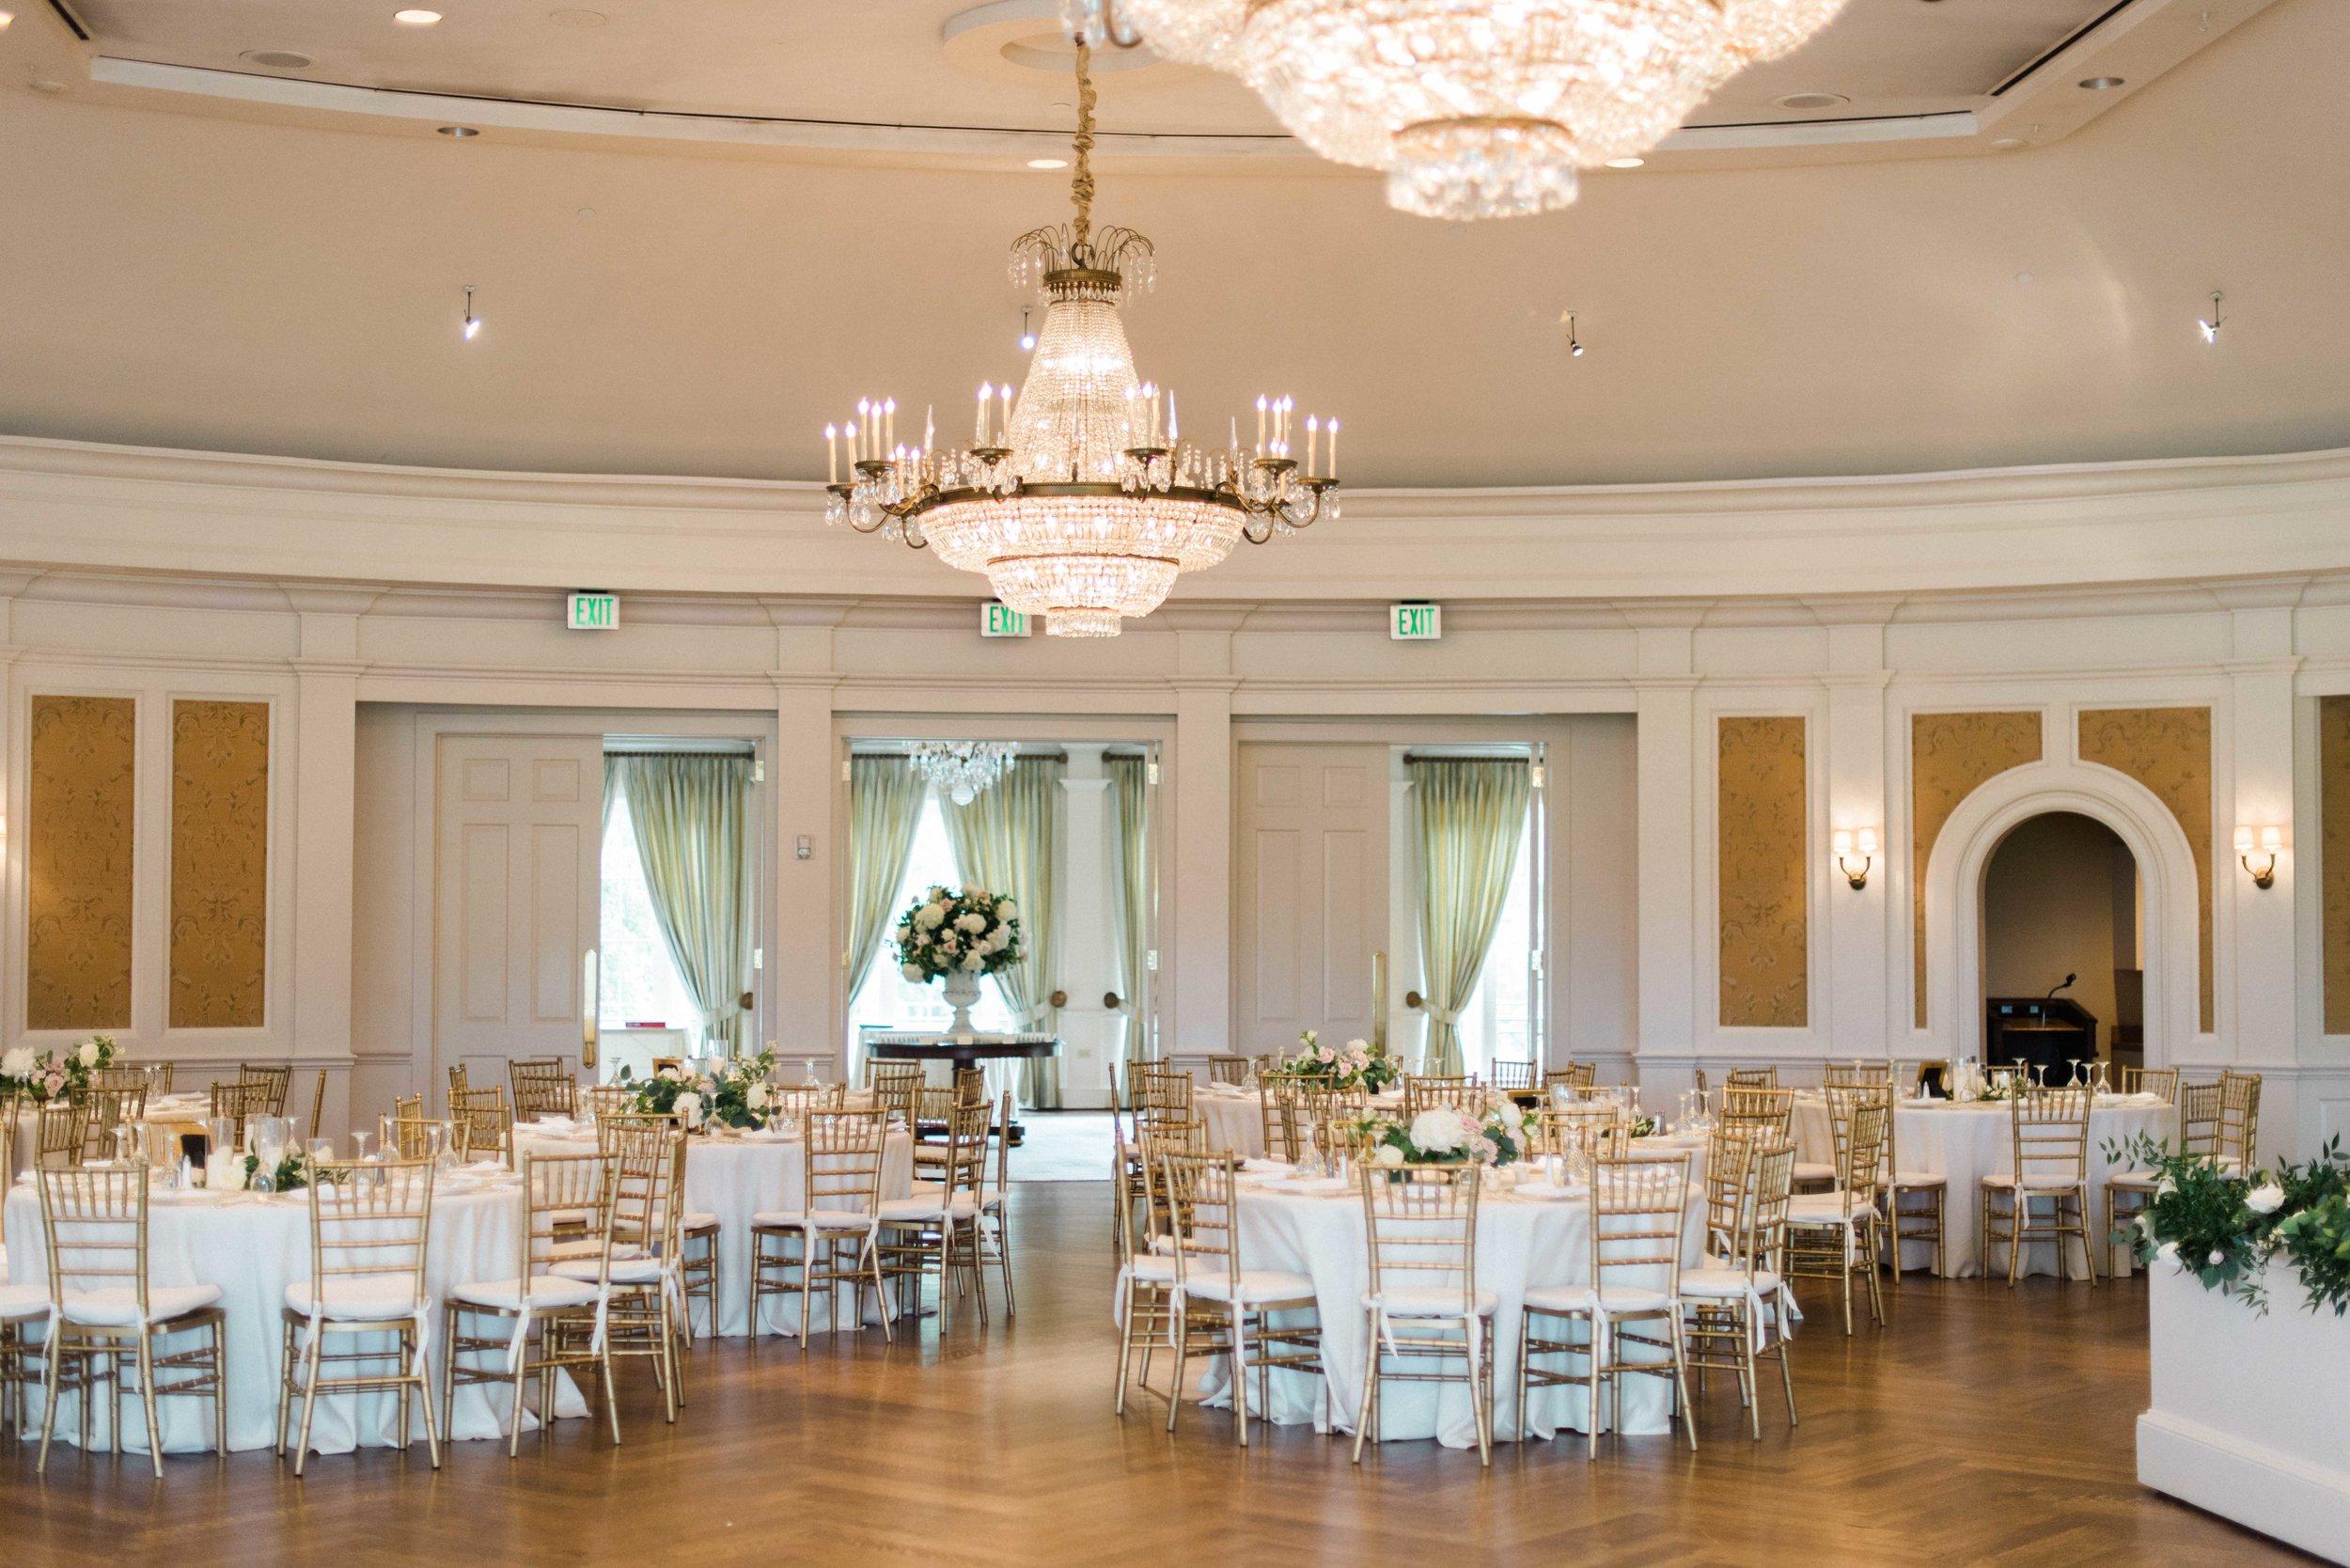 houston-wedding-planner-fine-art-luxury-designer-top-best-destination-austin-dallas-kelly-doonan-events-river-oaks-country-club-22